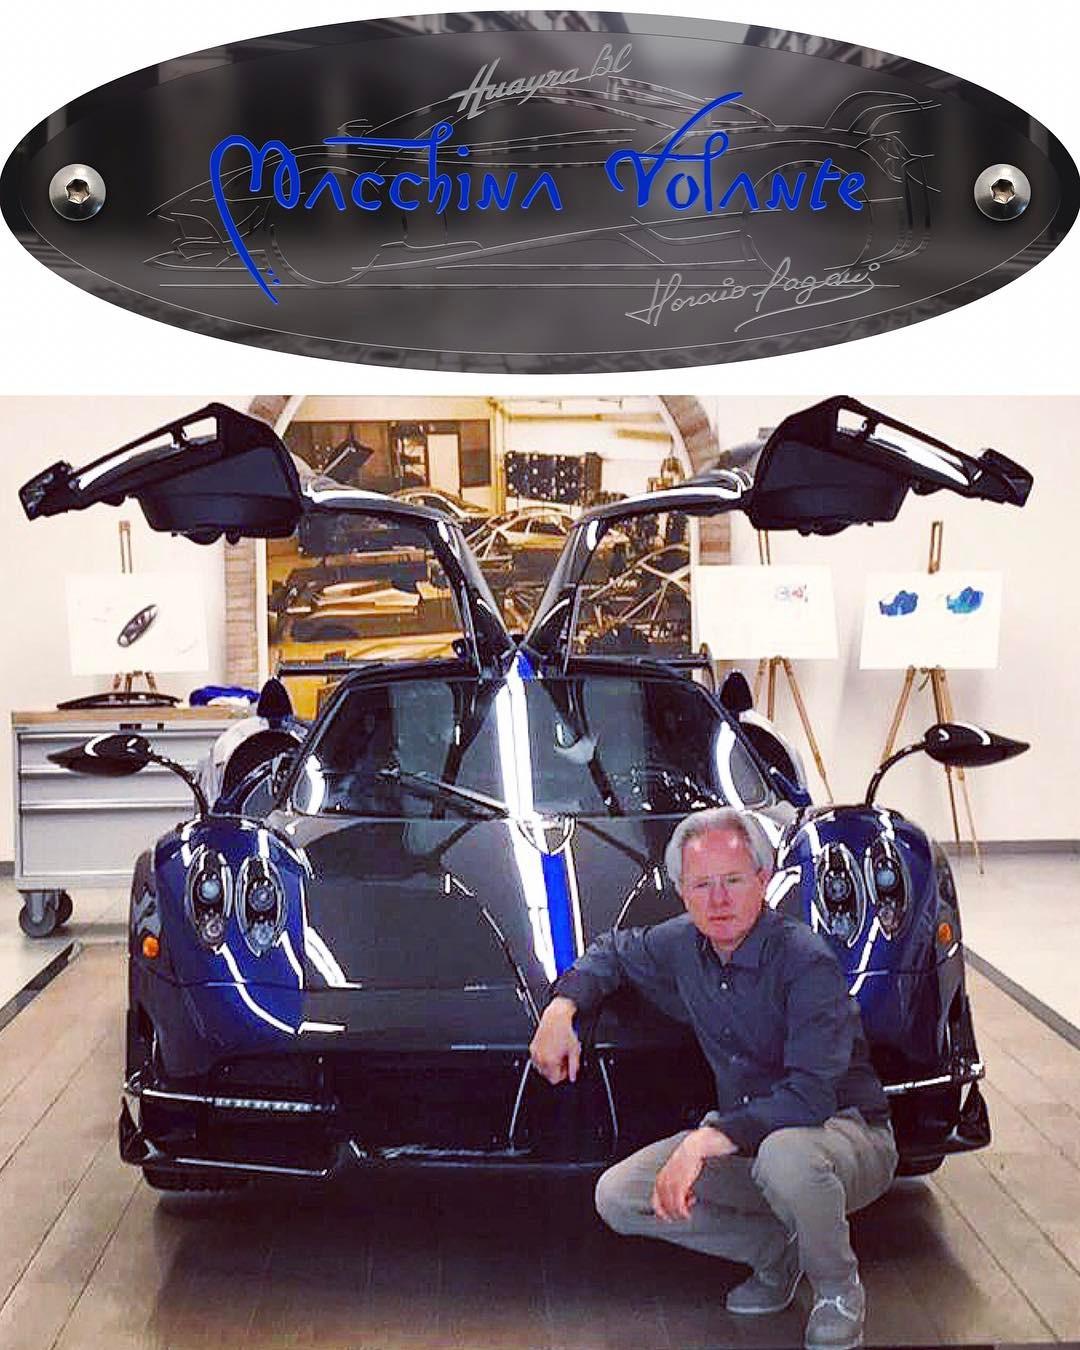 Special Pagani Huayra BC Macchina Volante Delivered to ...